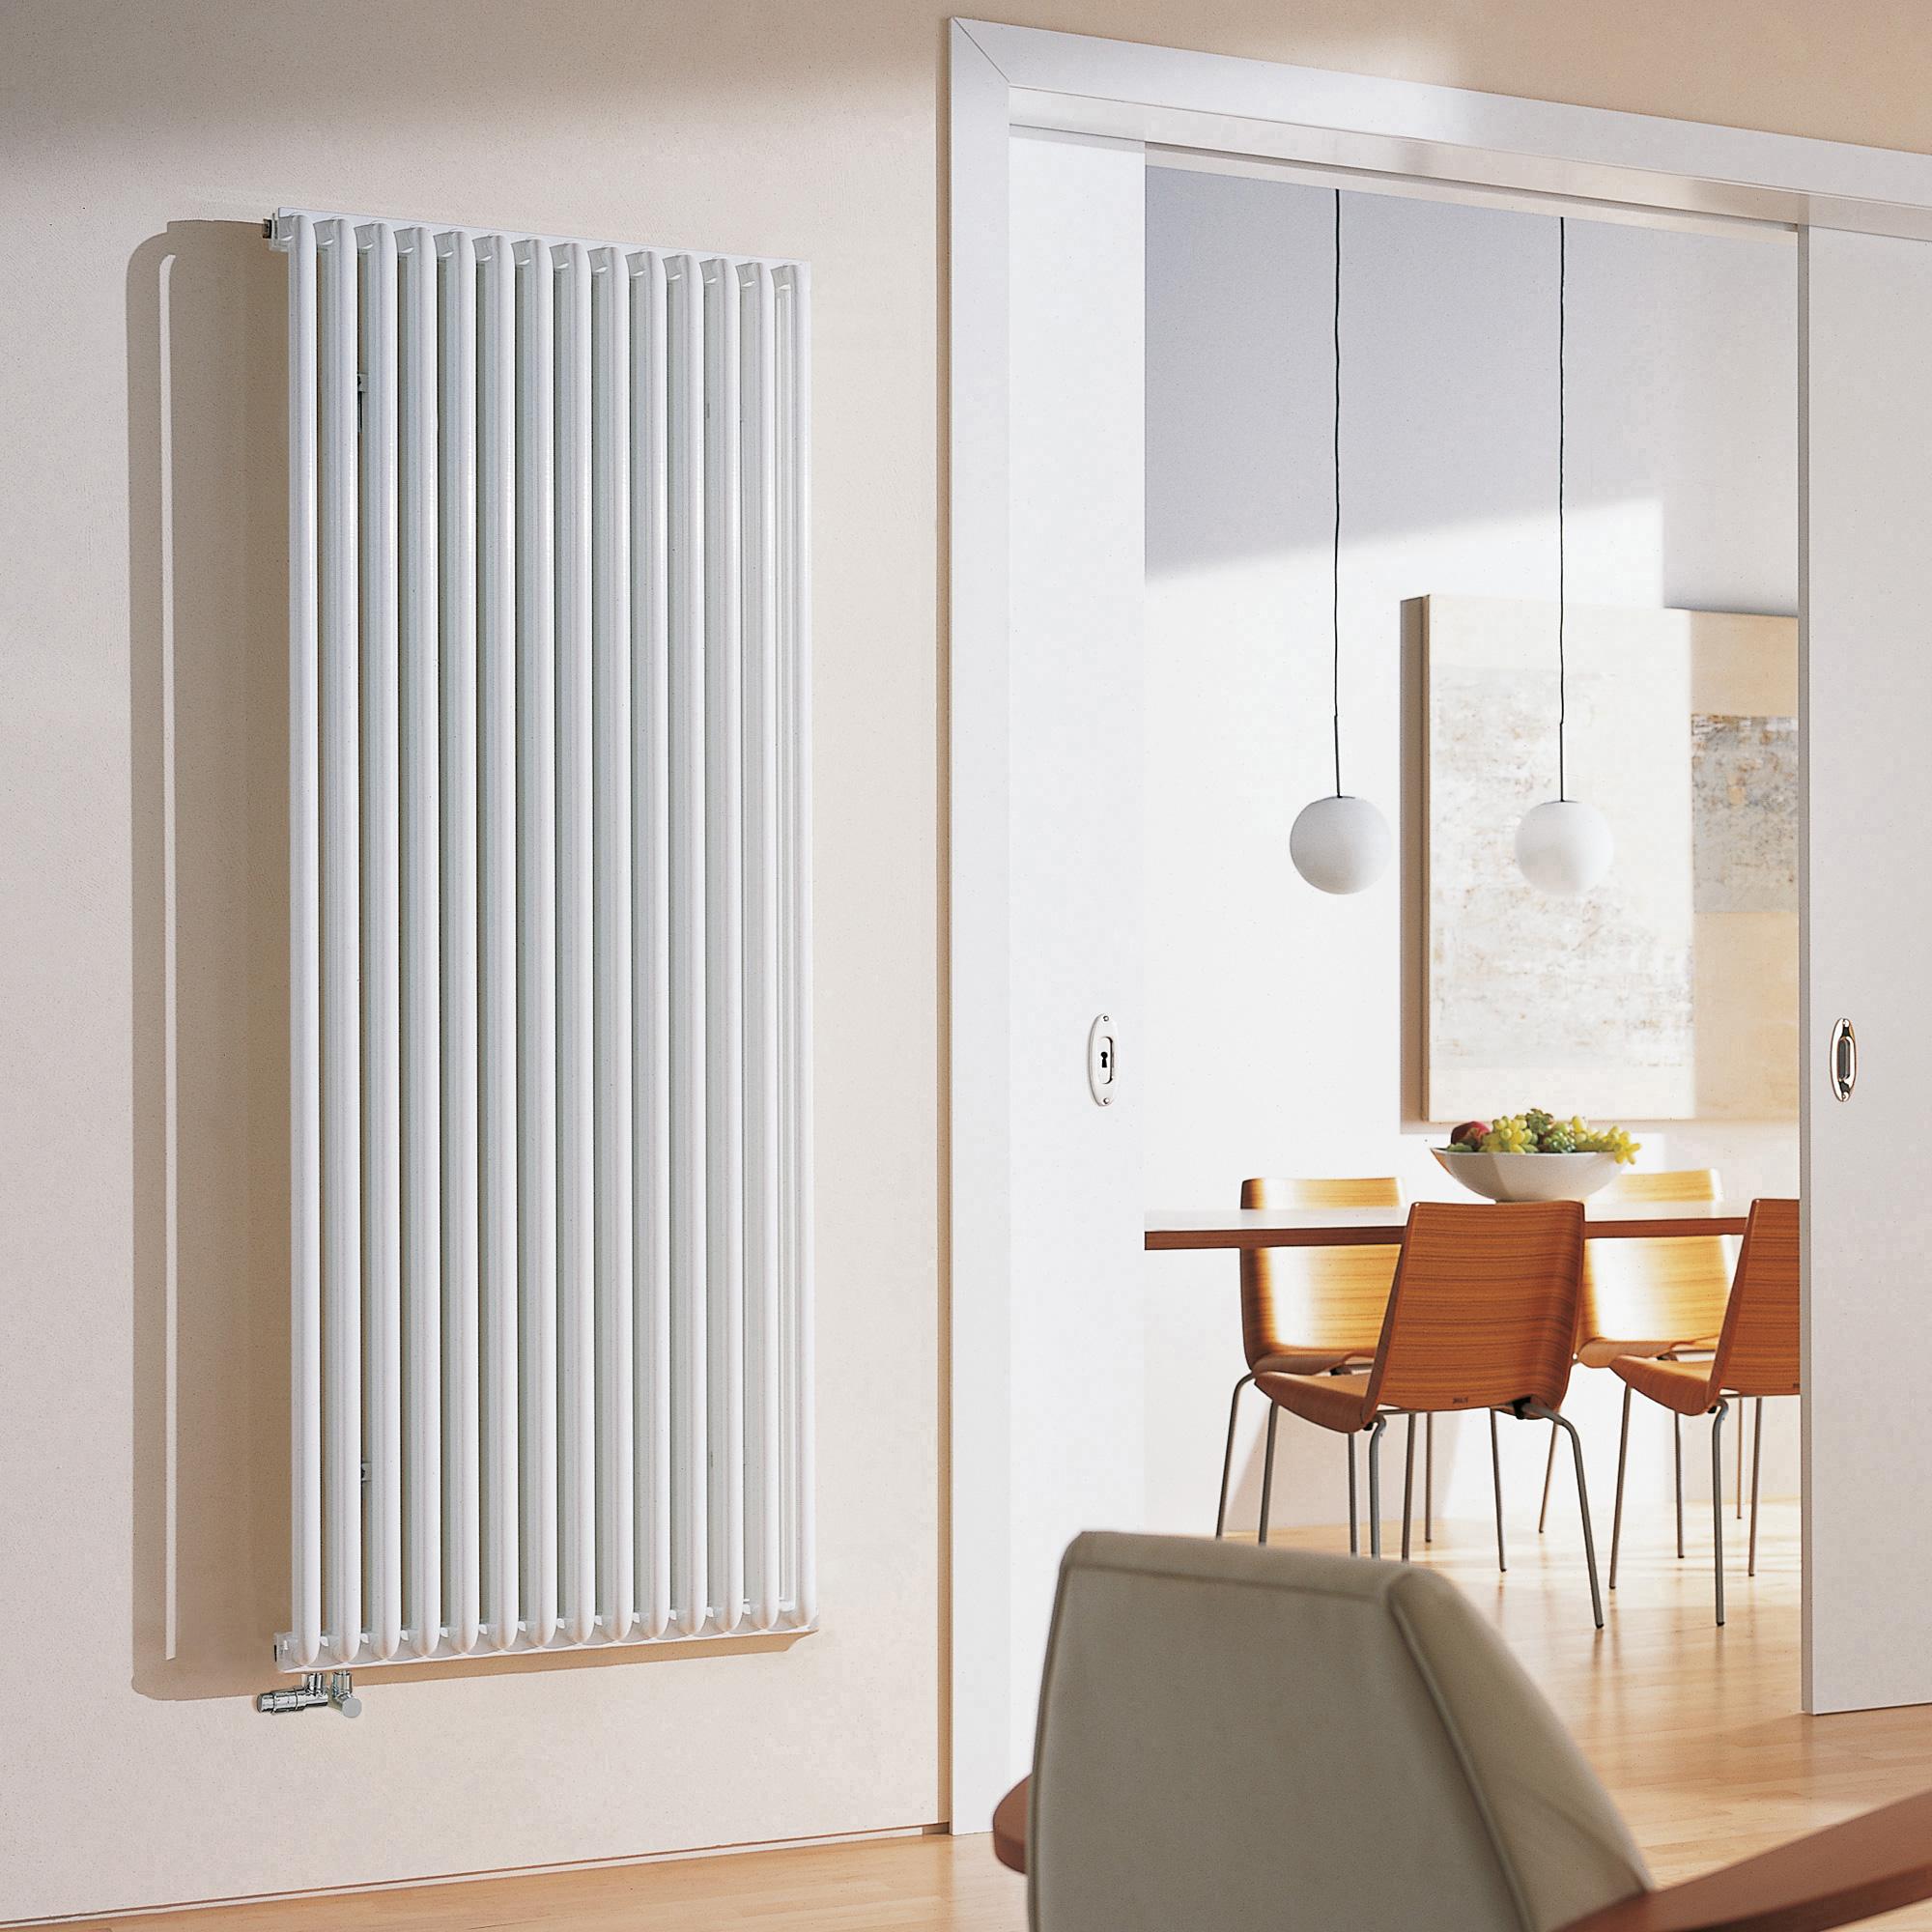 kermi decor s typ 21 heizk rper mit anschluss unten wei b 46 h 180 cm 1330 watt. Black Bedroom Furniture Sets. Home Design Ideas